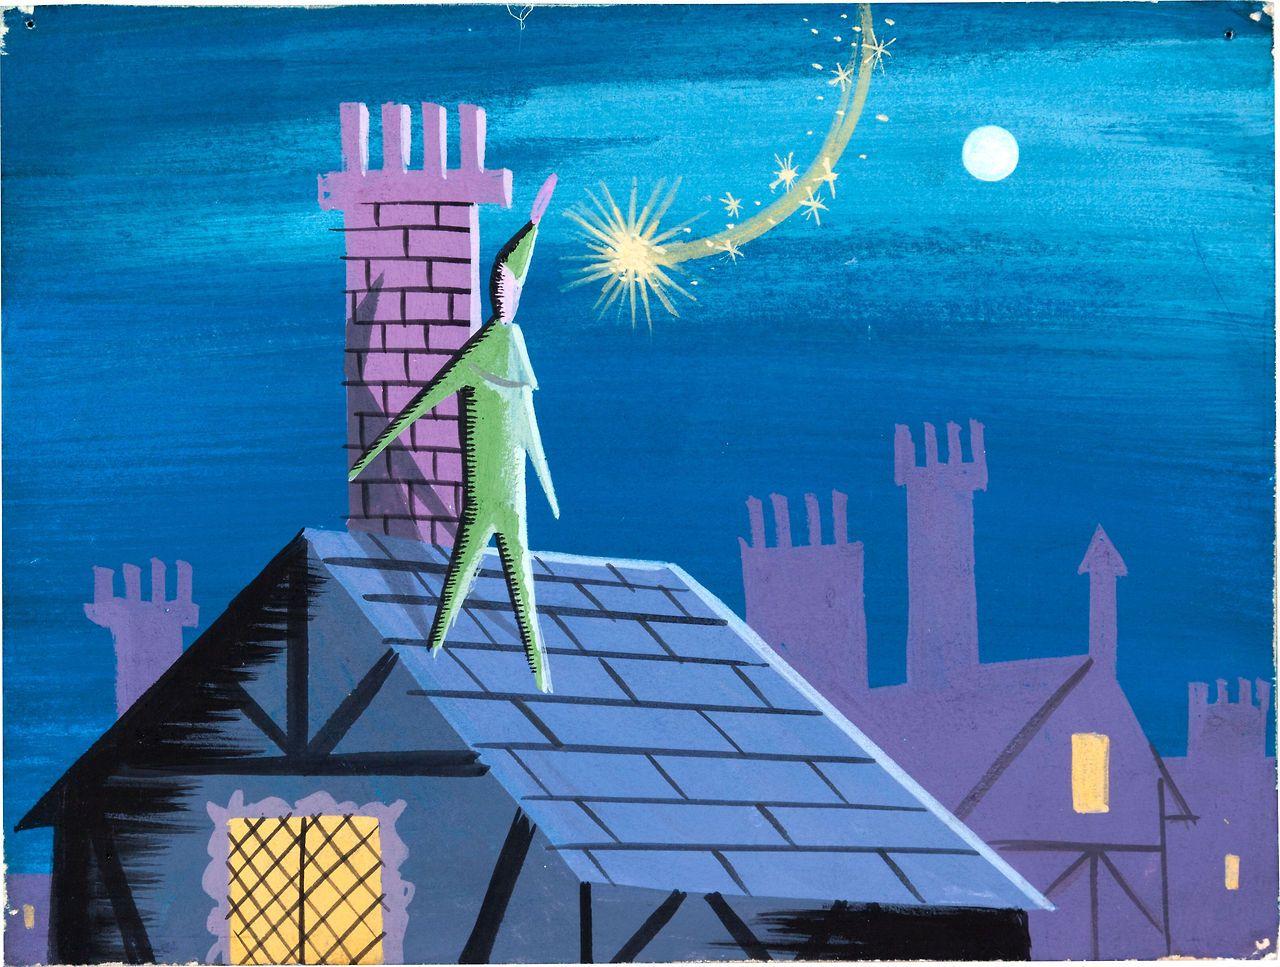 Original Peter Pan concept art by Mary Blair.